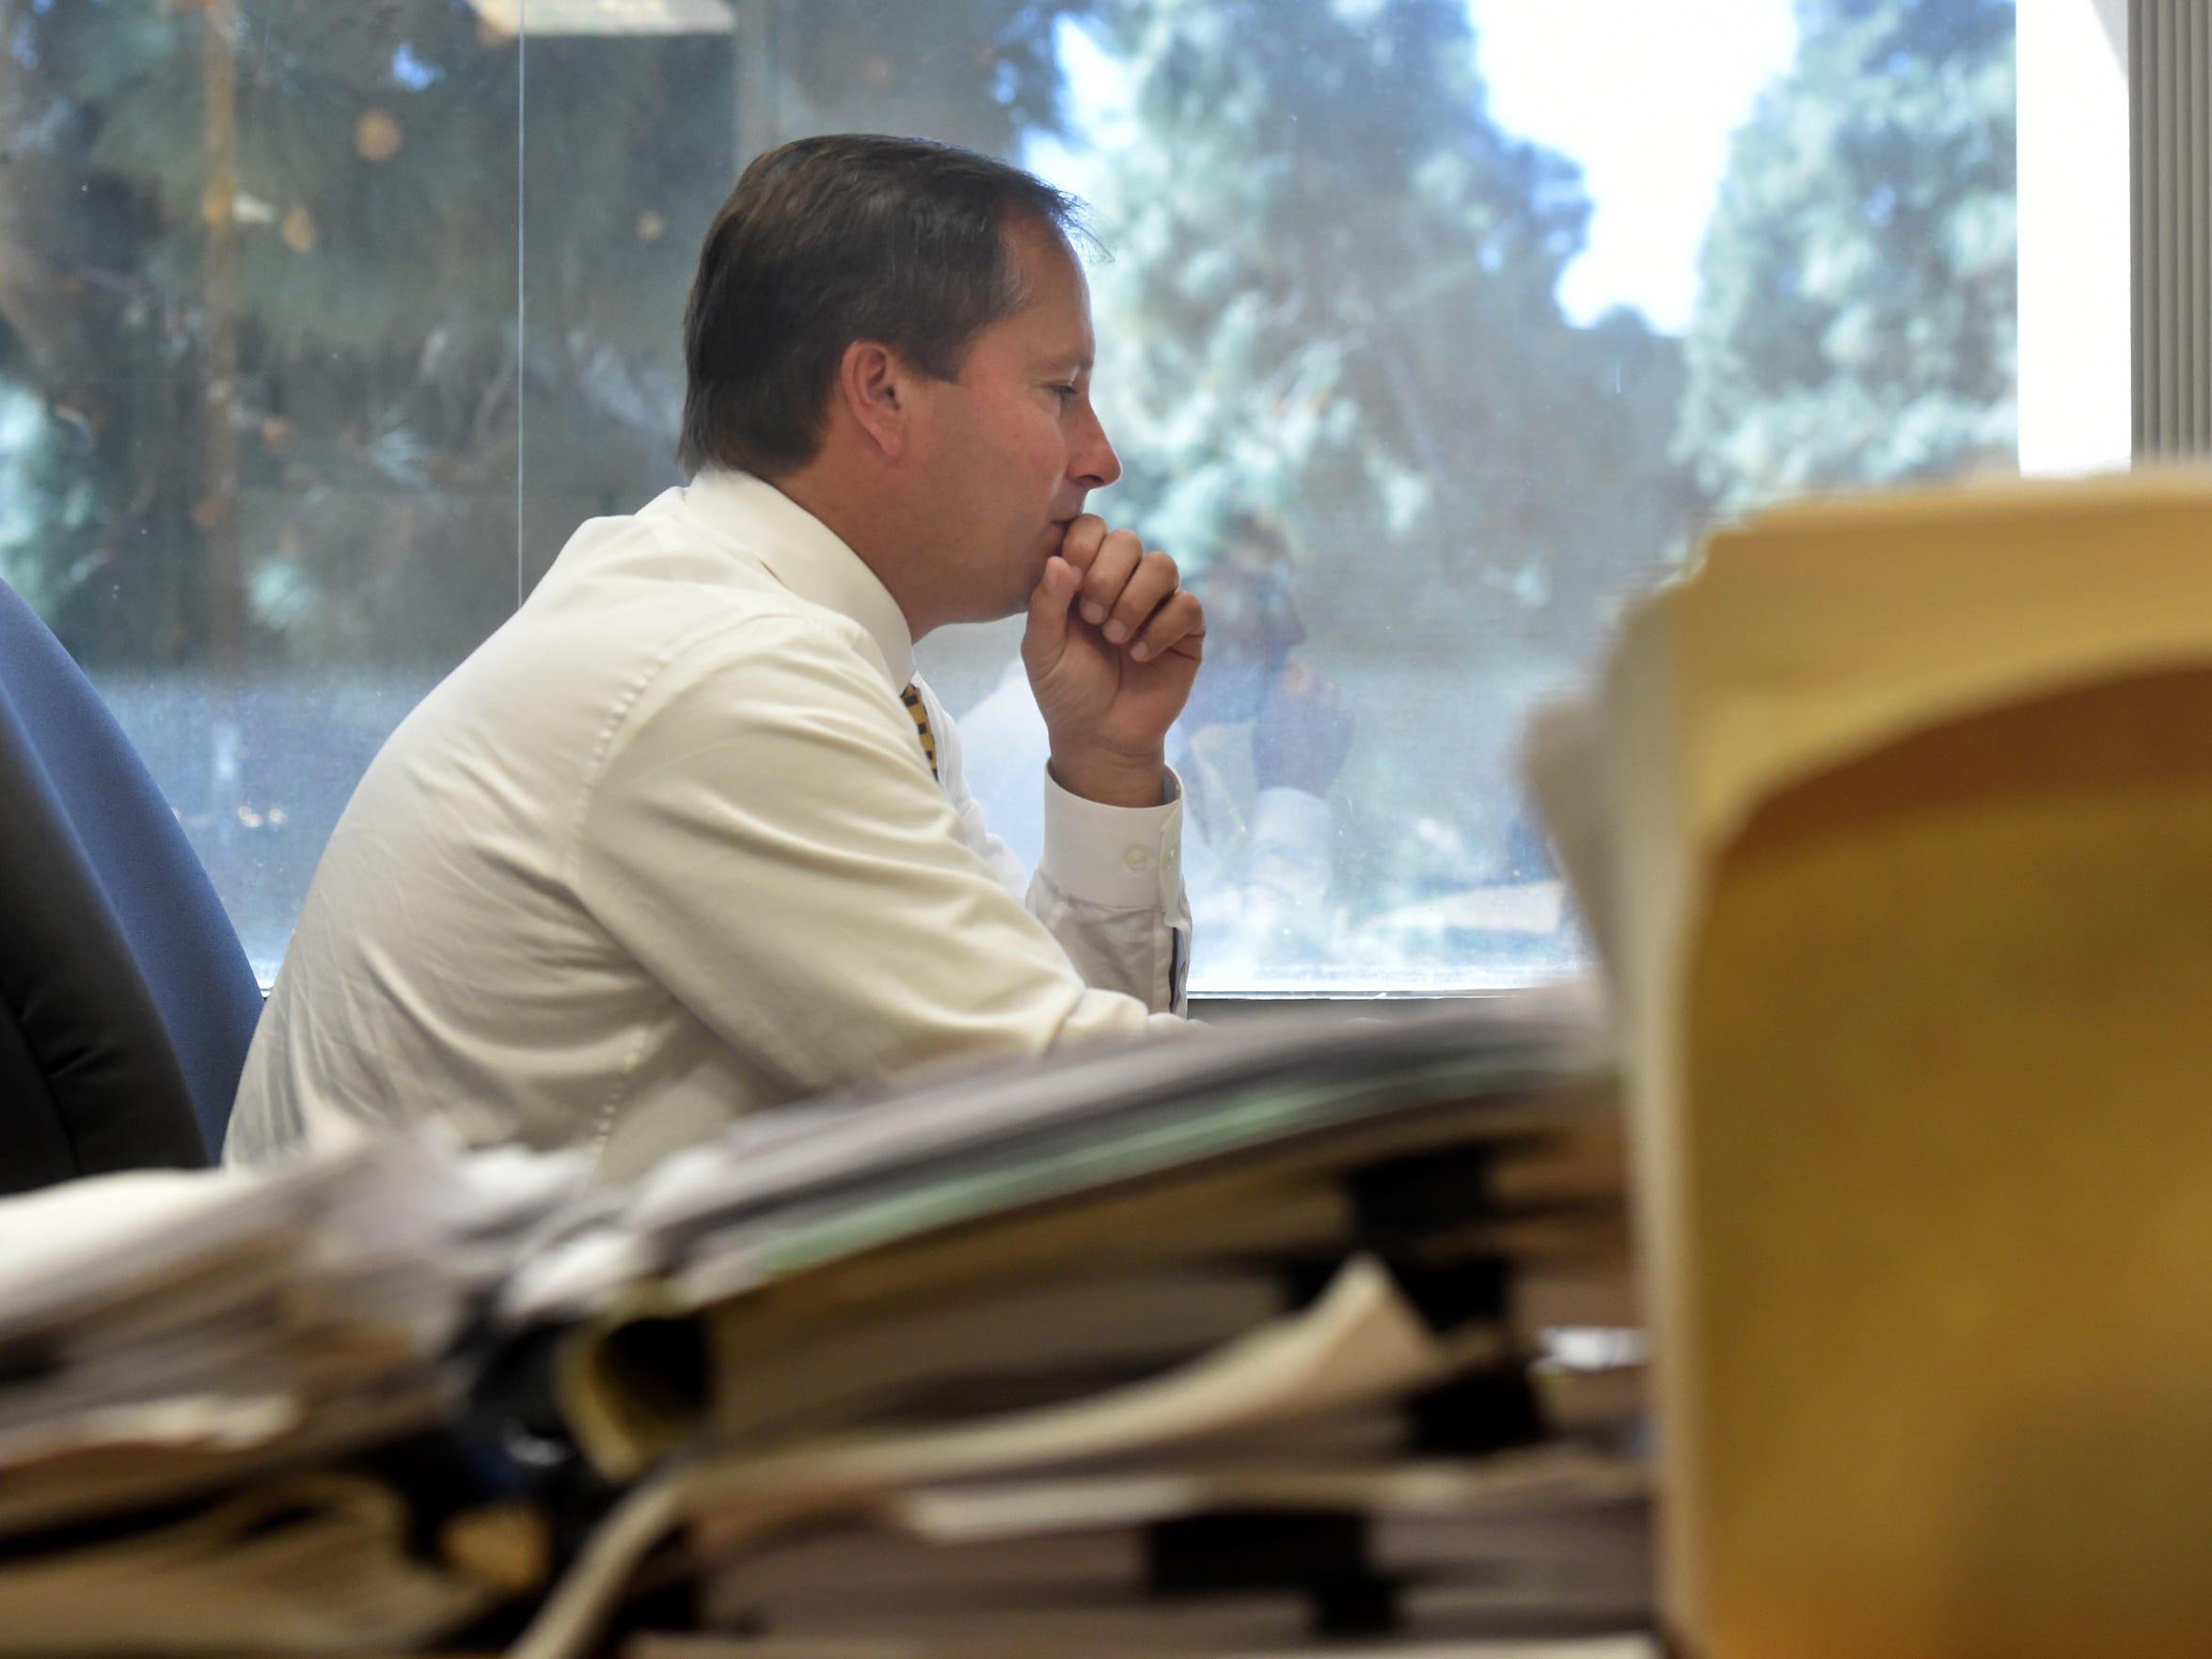 William Quest, a senior deputy public defender, works at his desk at the Ventura County Public Defender's Office.